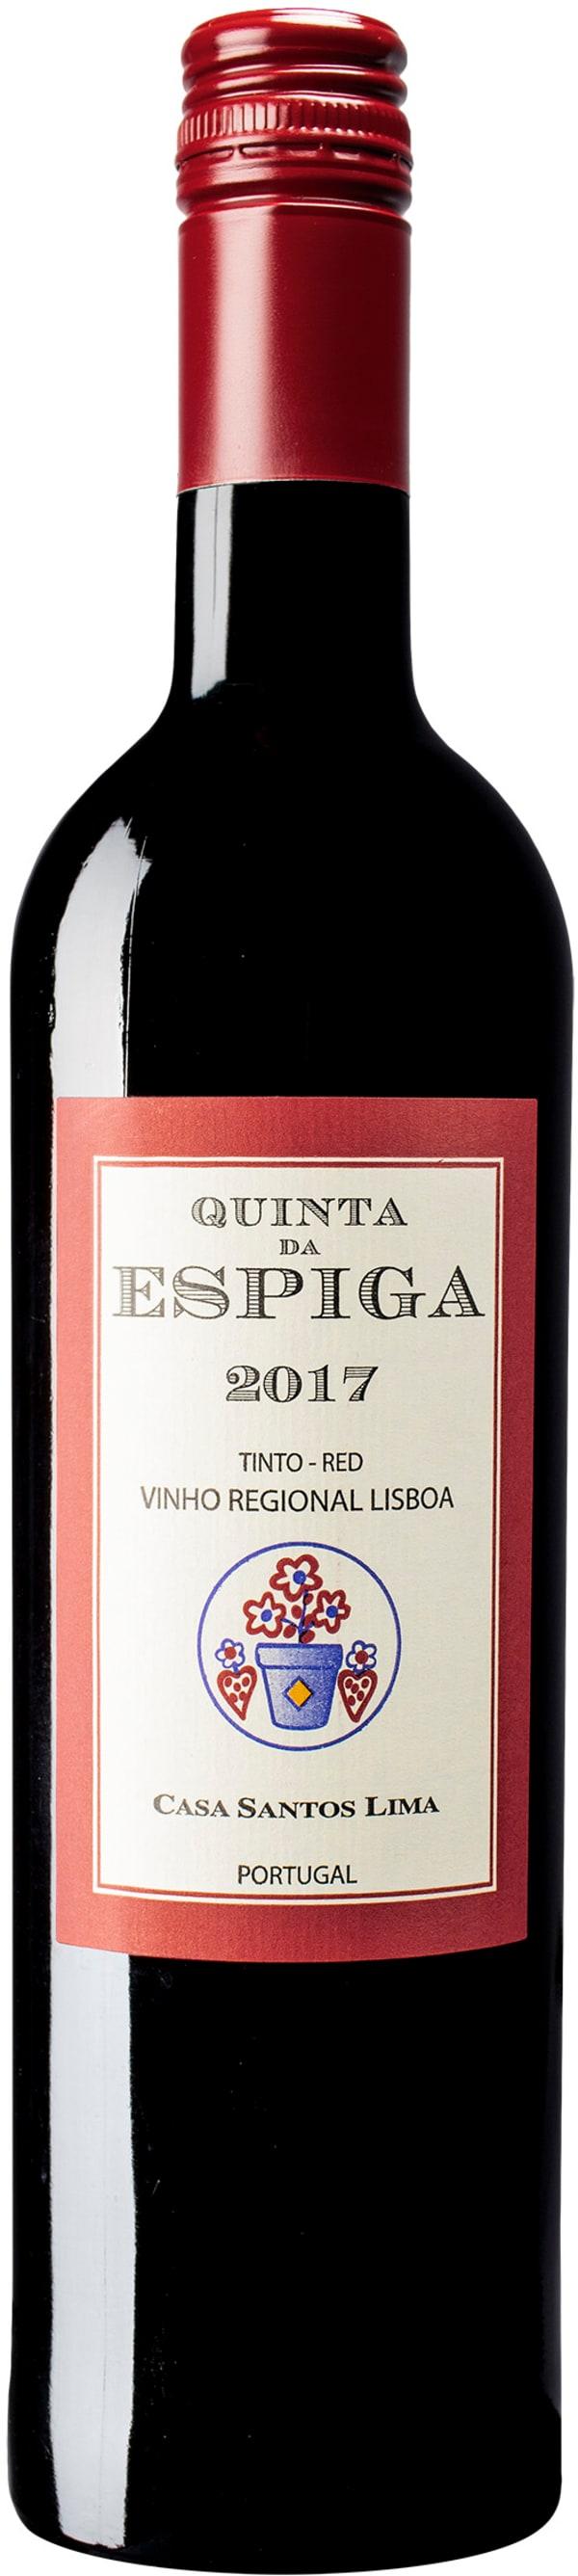 Quinta da Espiga 2016